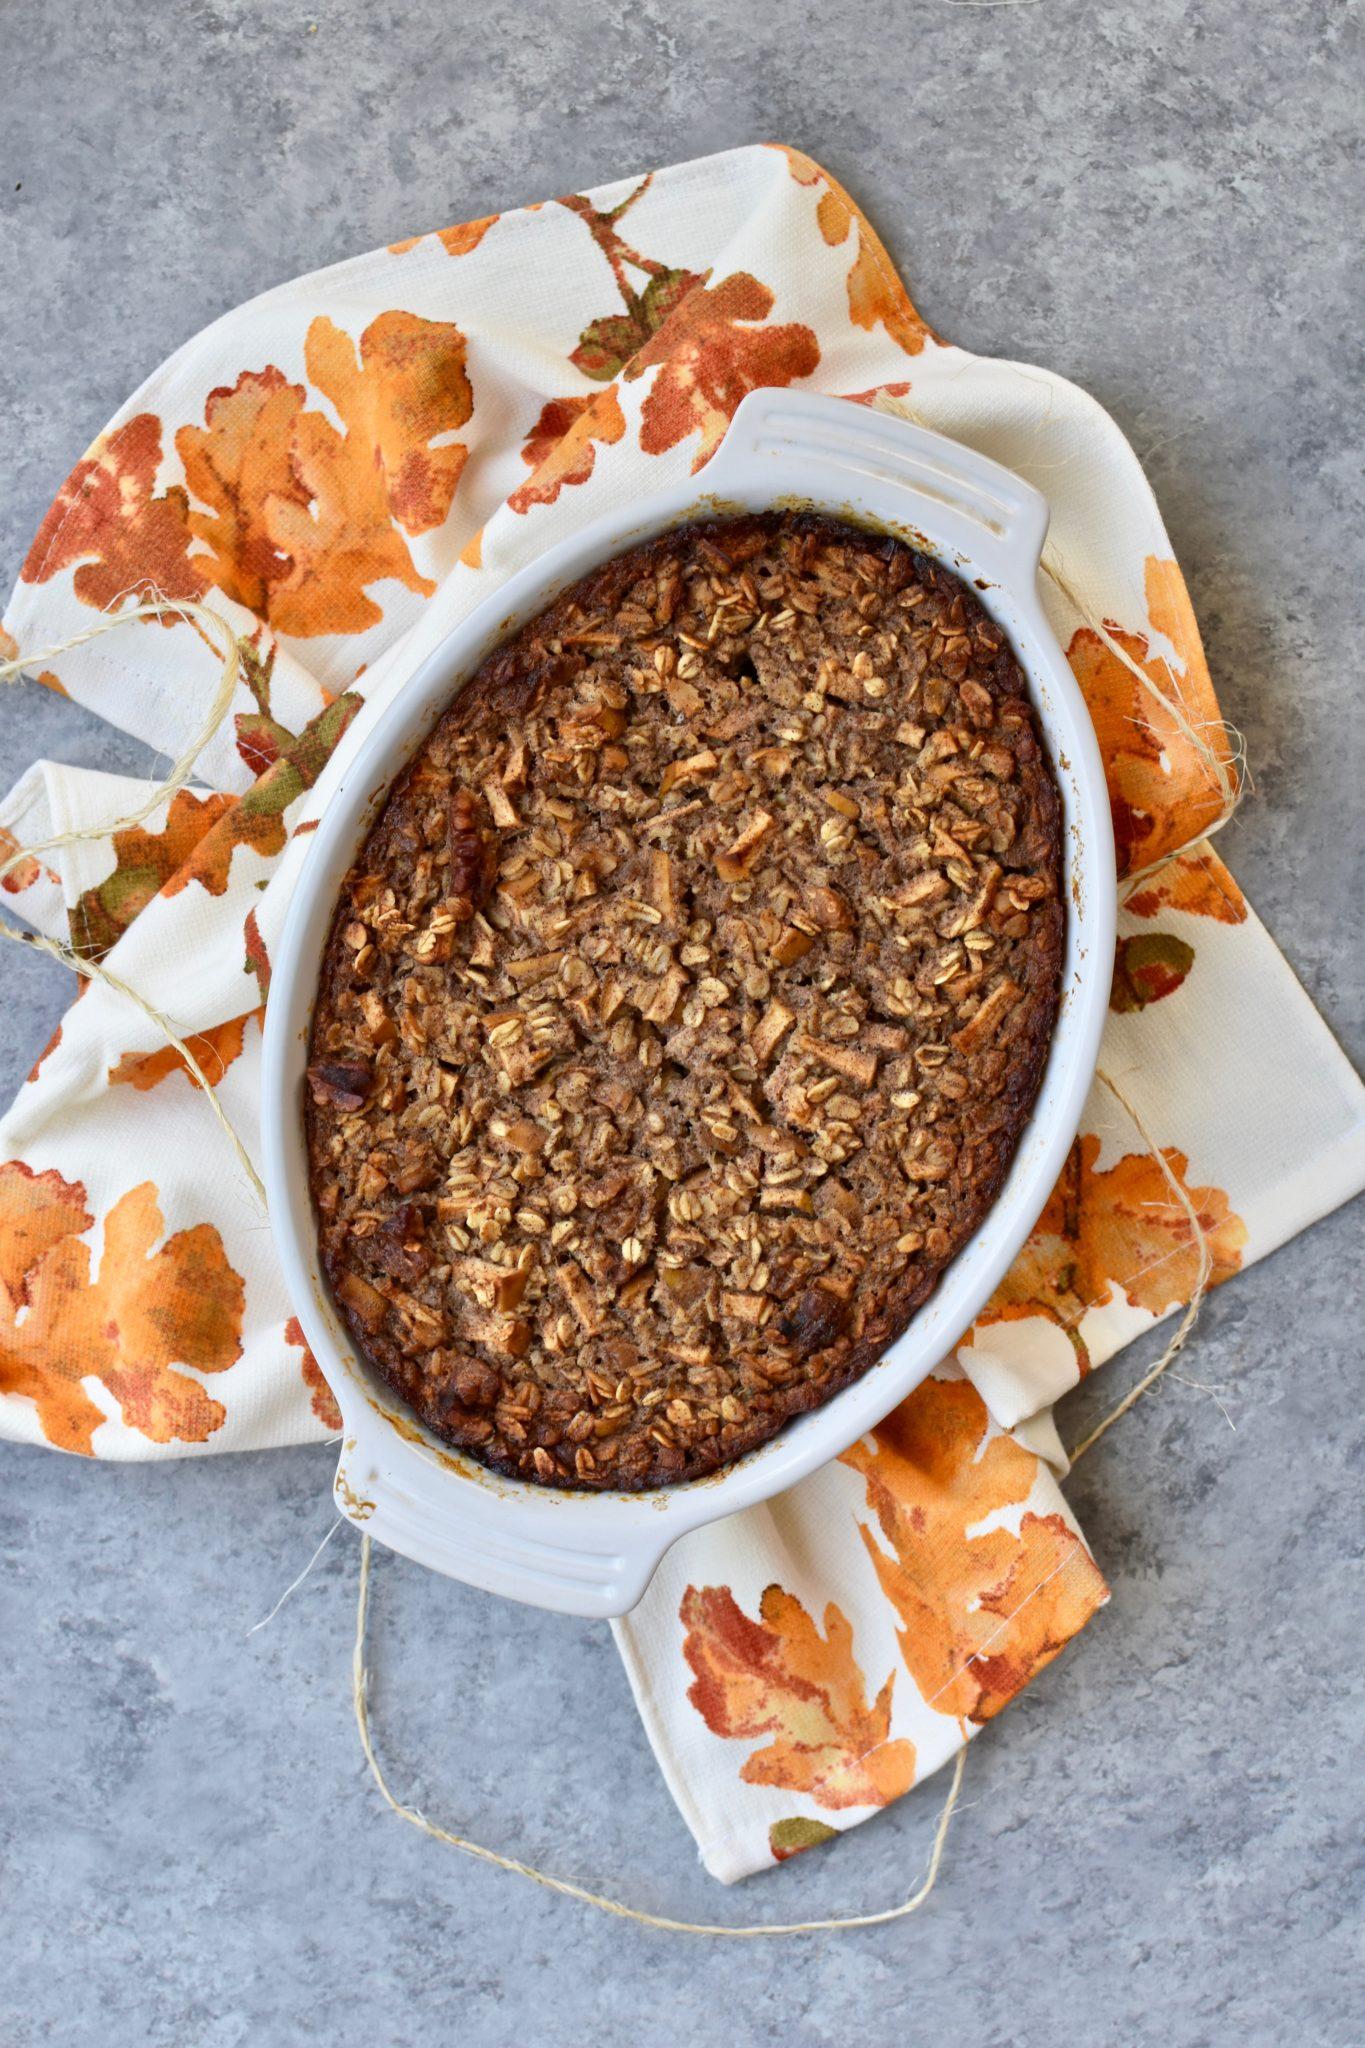 apple cinnamon walnut baked oatmeal // cait's plate